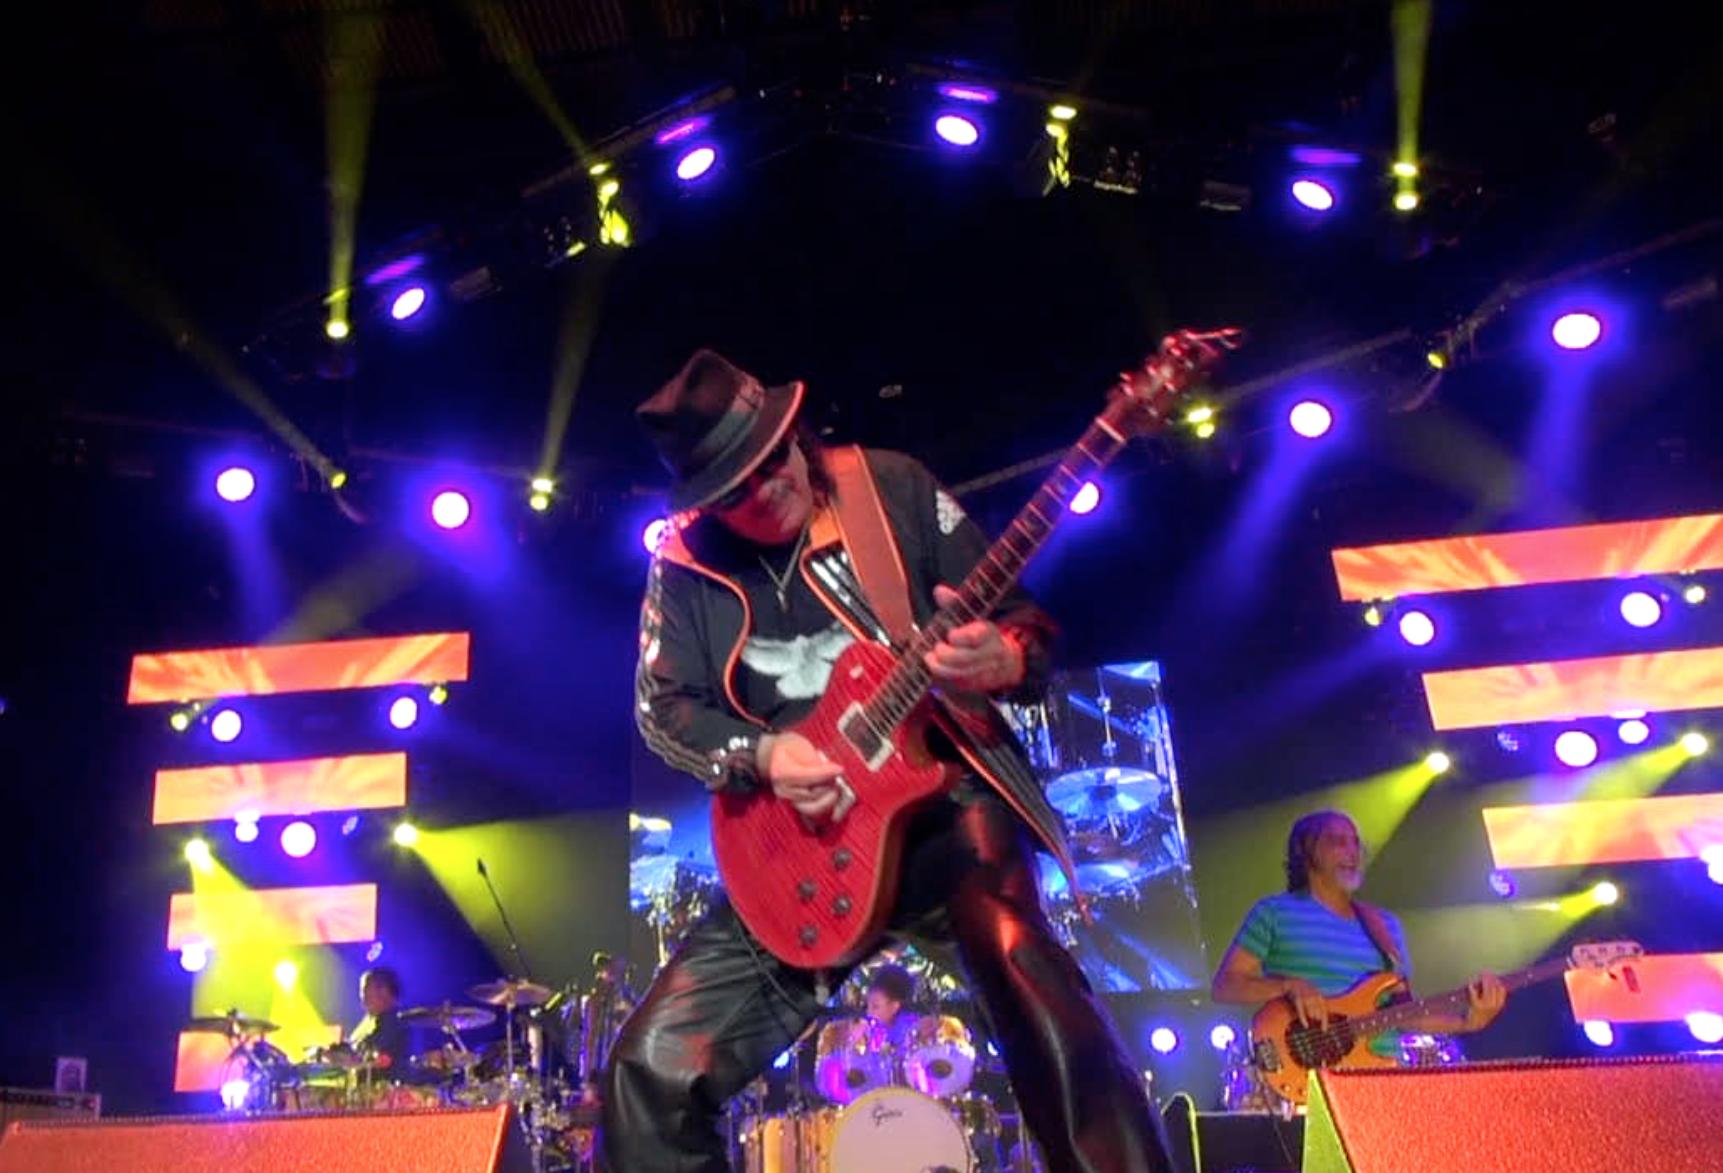 Image:Santana 2